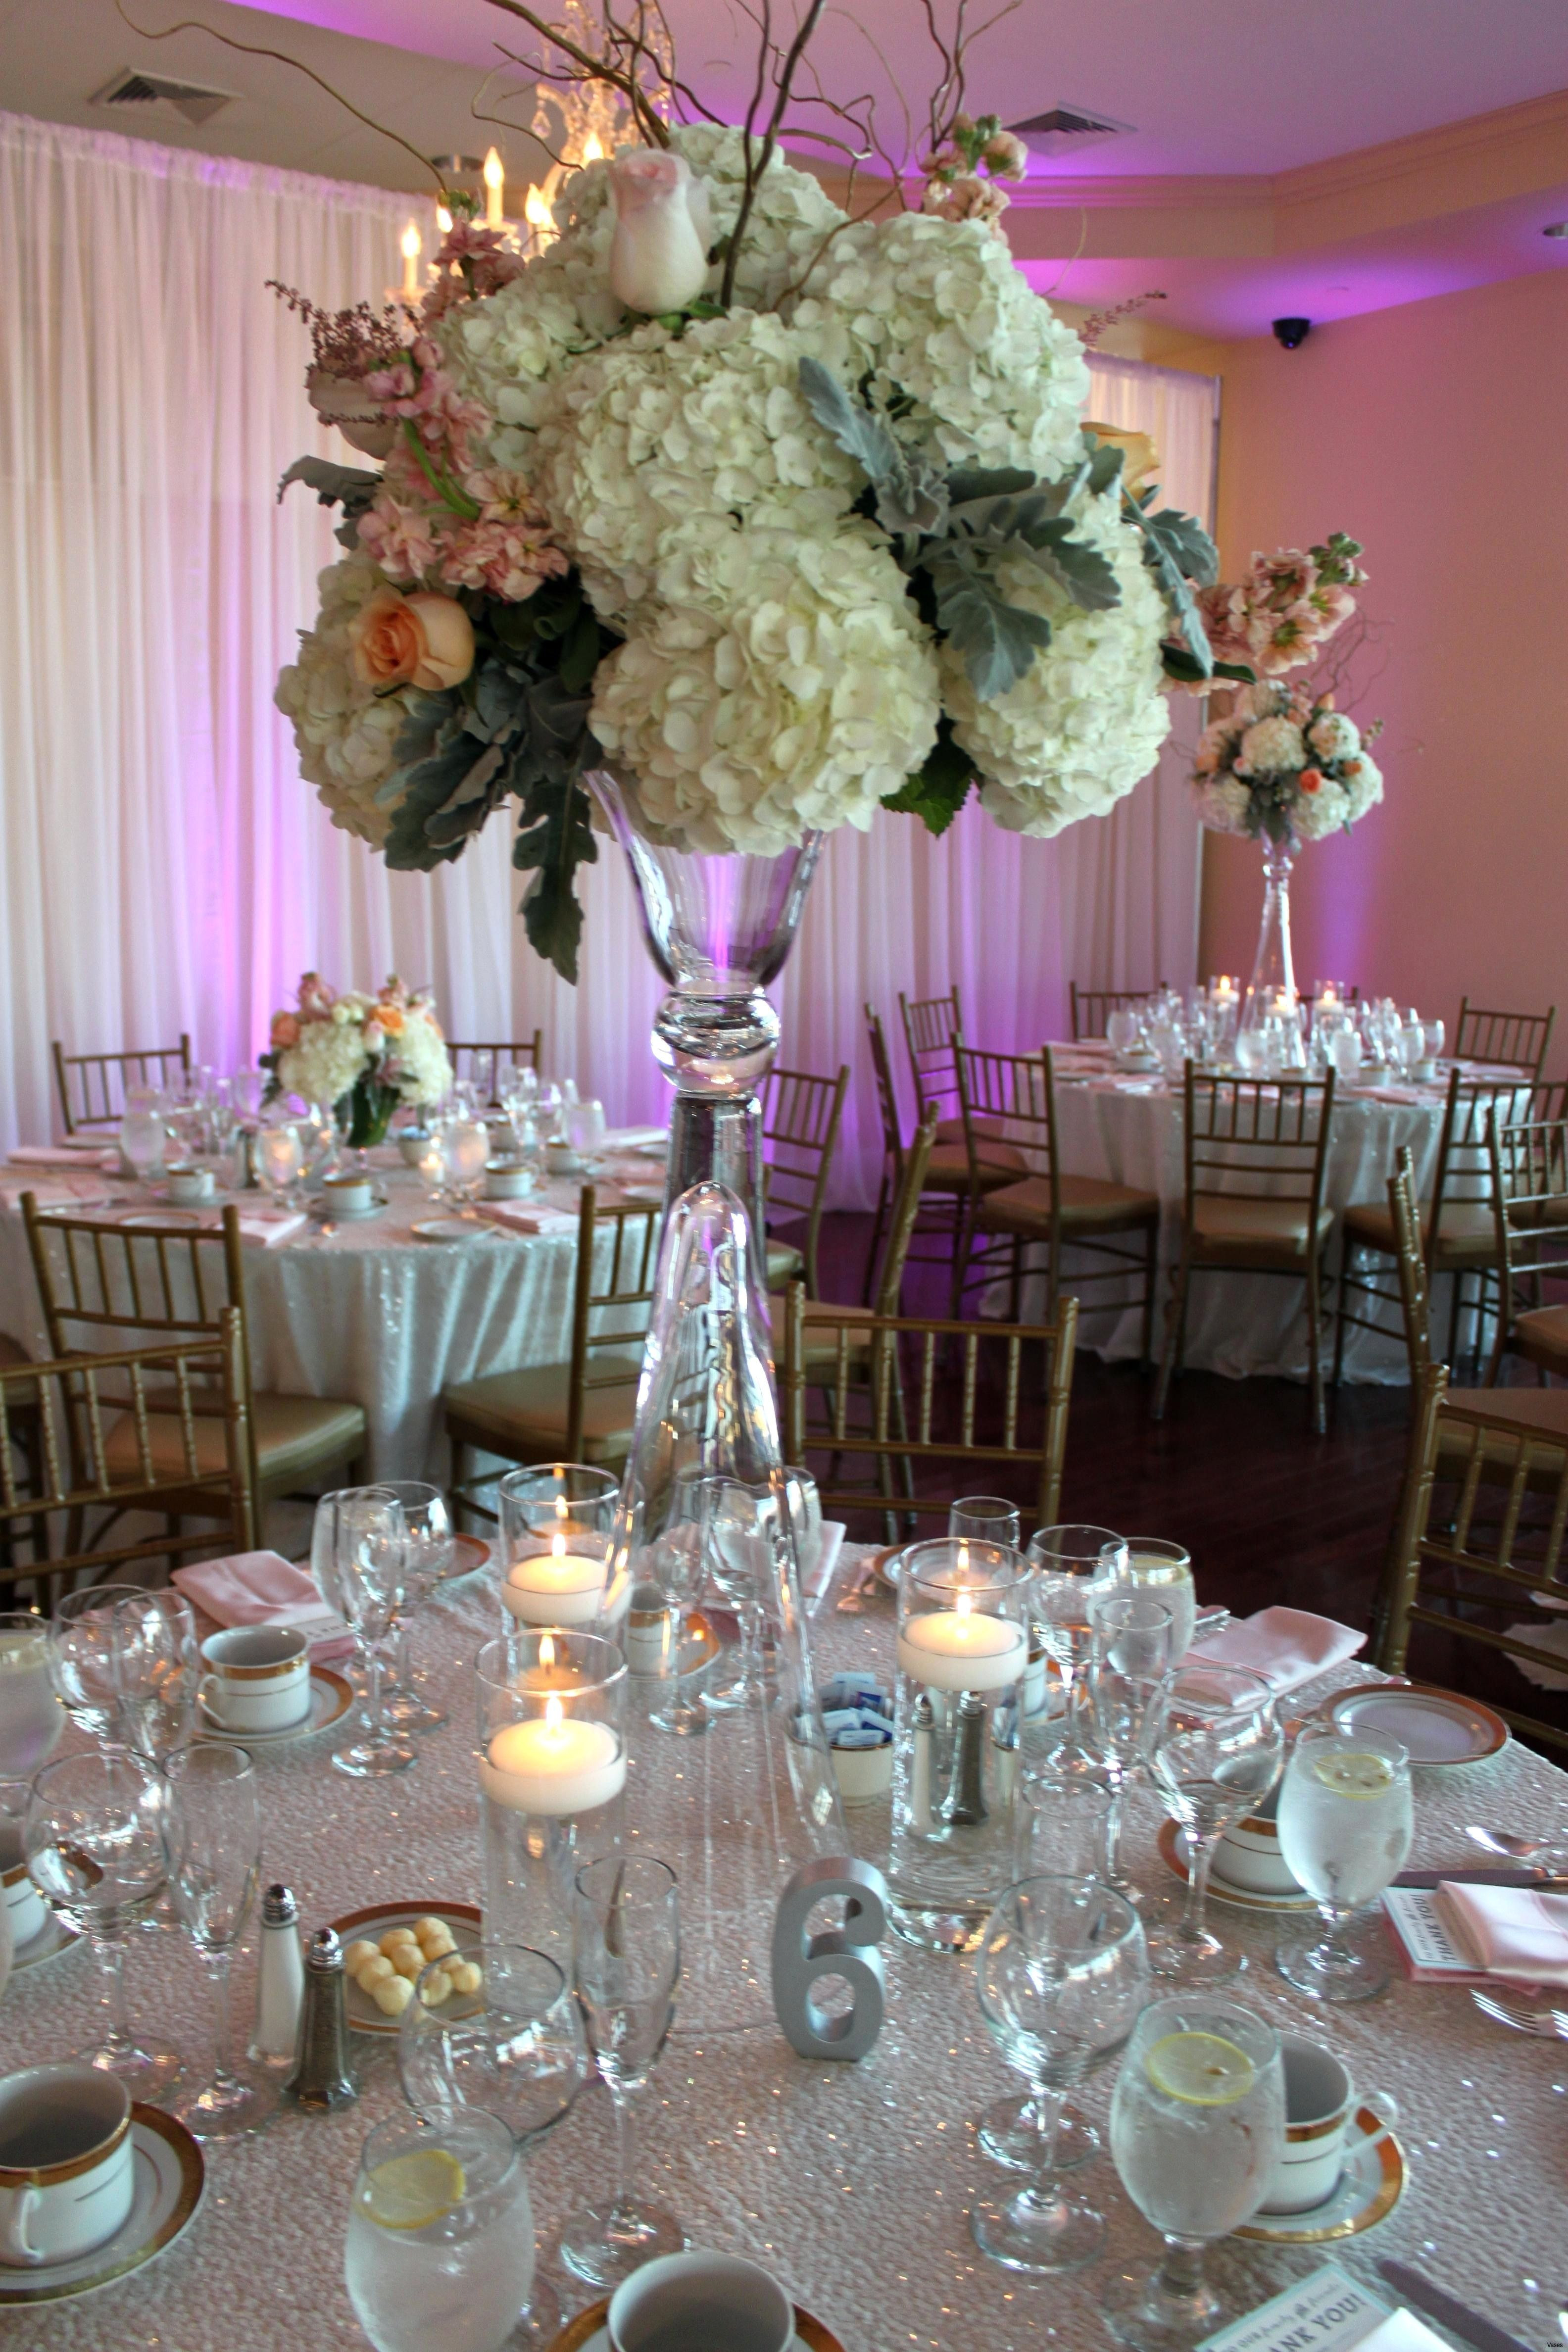 11 Great wholesale Trumpet Vases for Weddings | Decorative ...